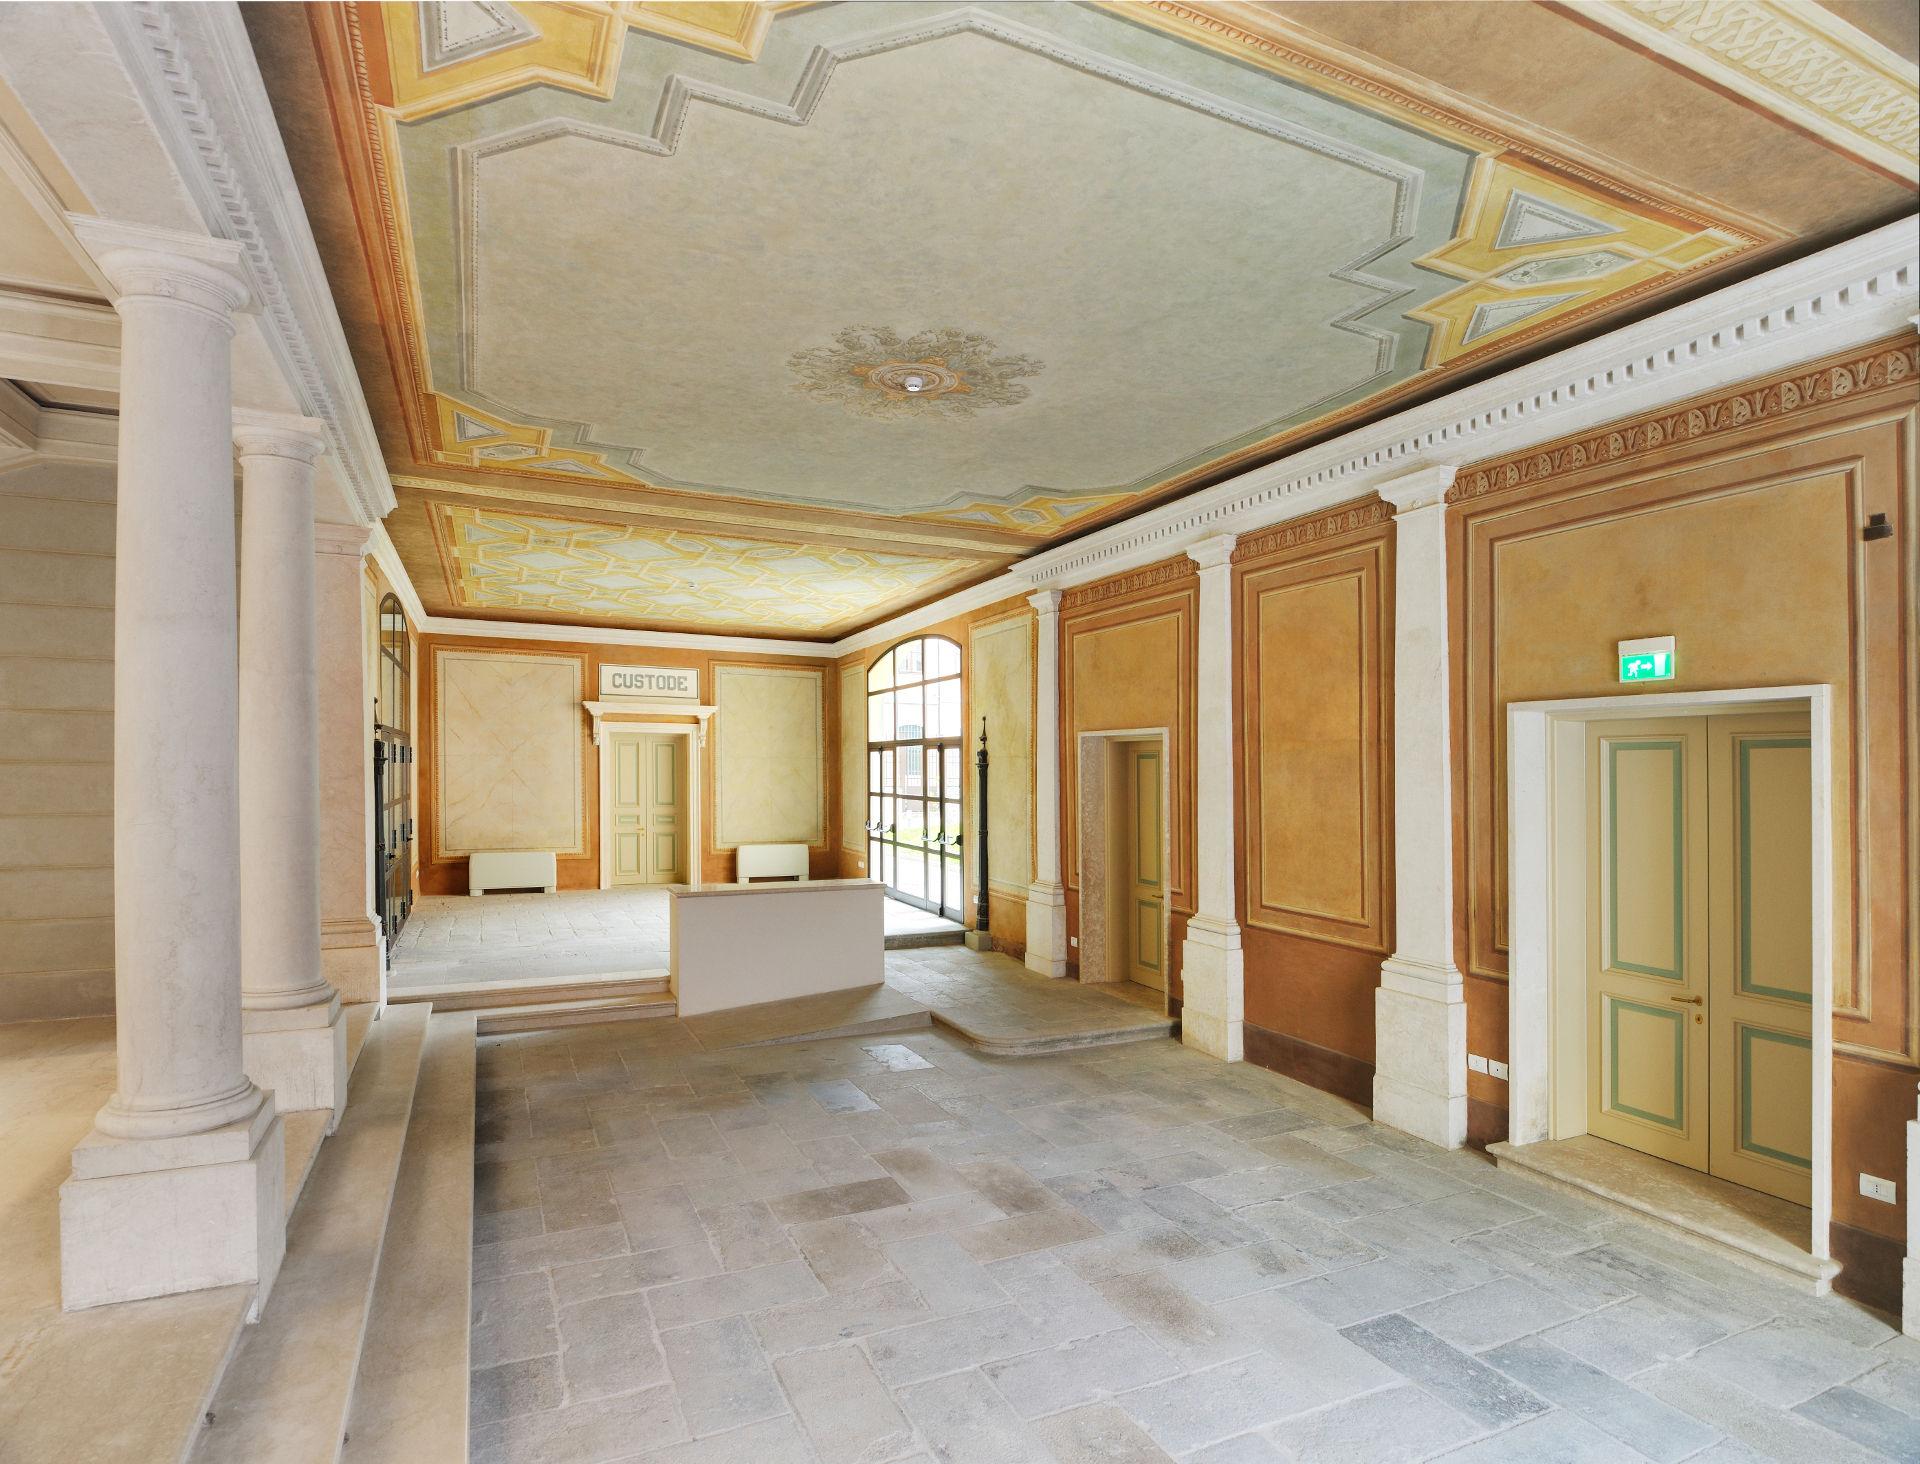 Palazzo Dondi dall'Orologio - image 1